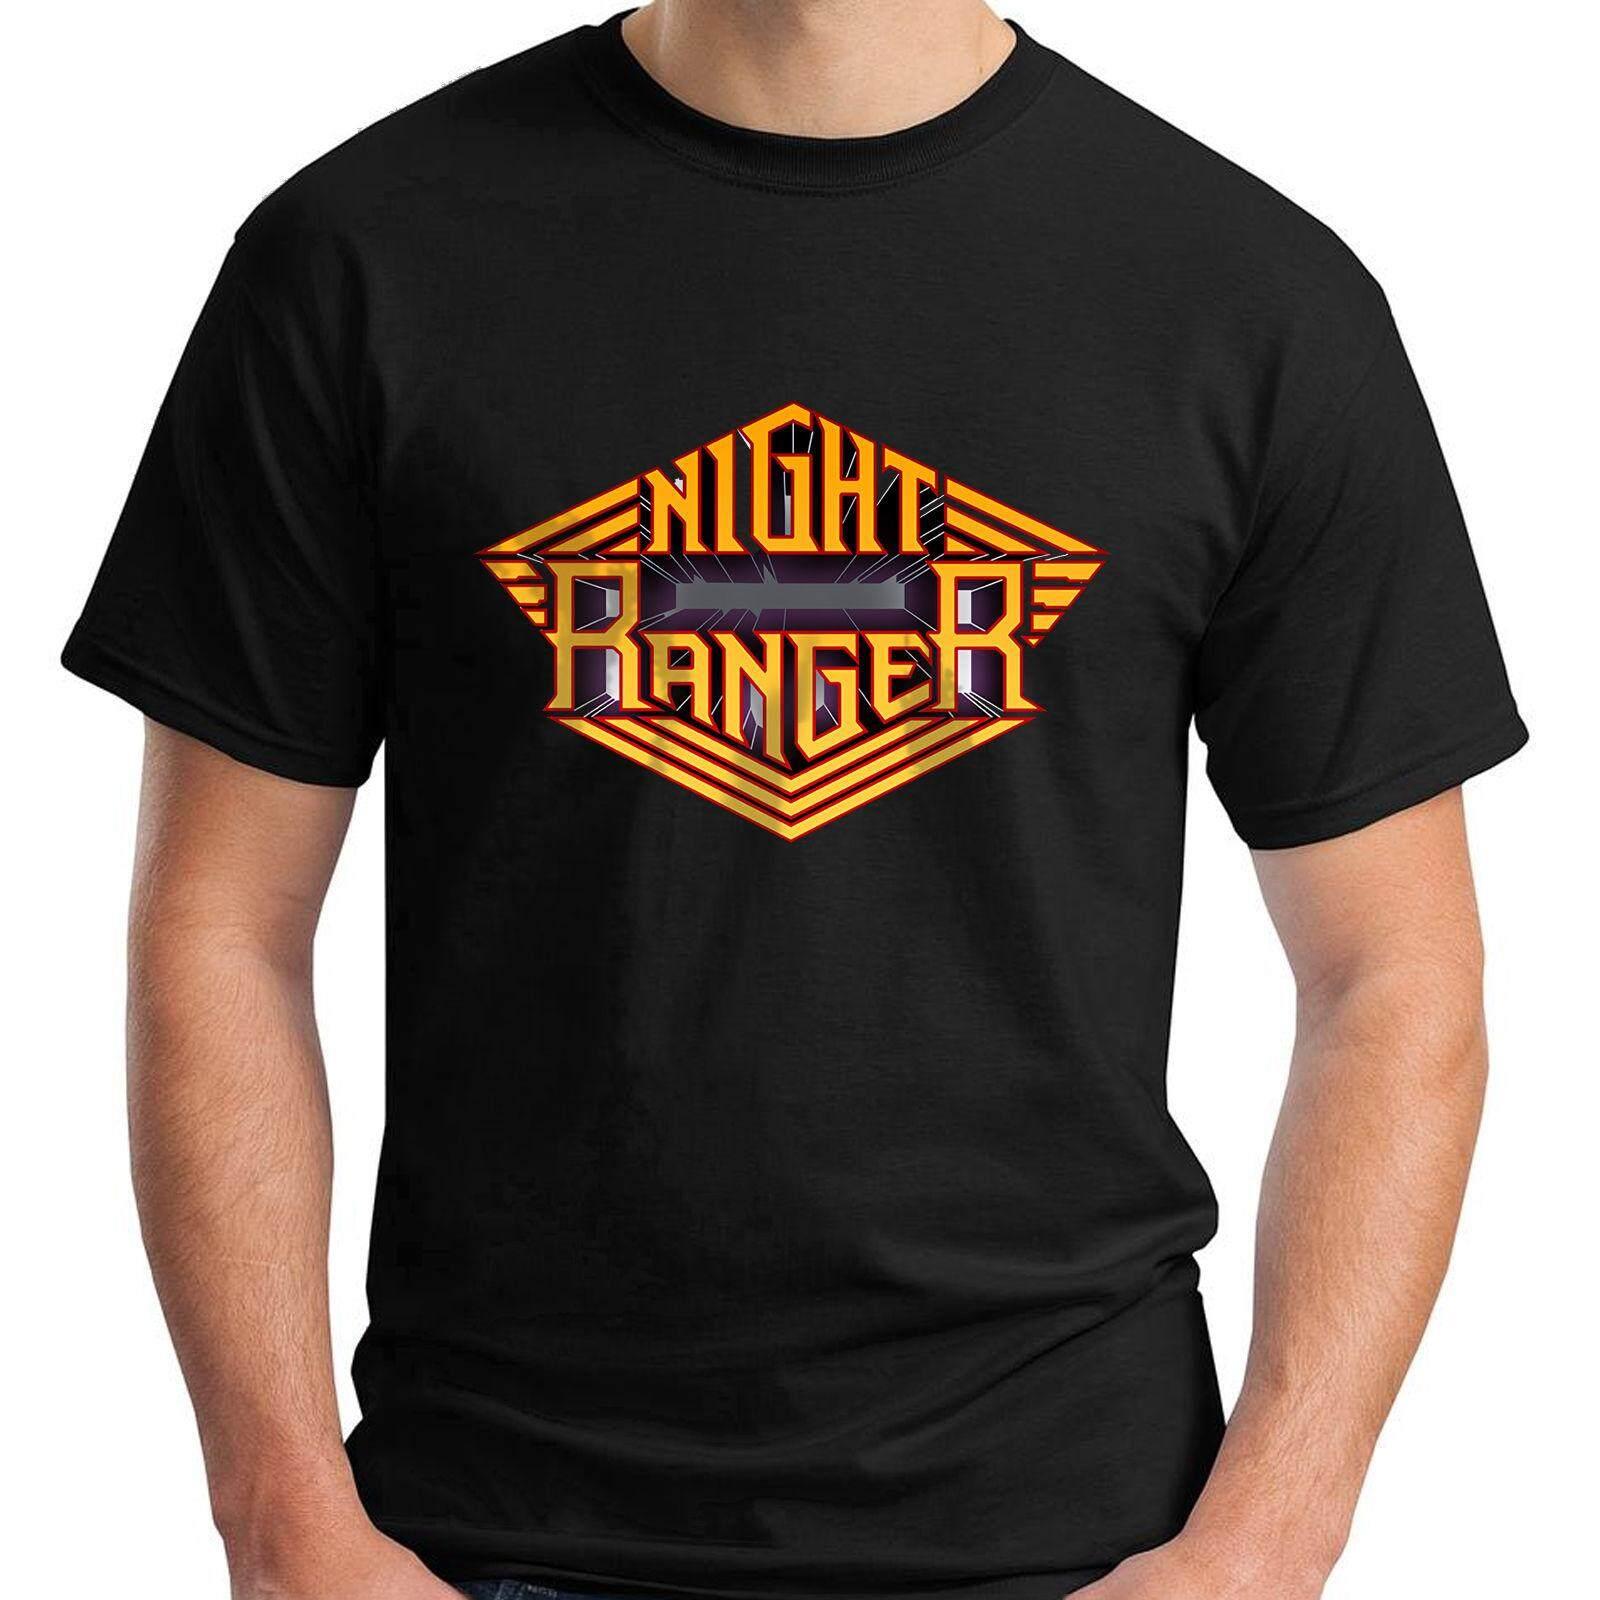 Malam Ranger Keras Rock Kaos Katun Pria Lengan Pendek Kaus Manusia Kaus Bulat-Internasional